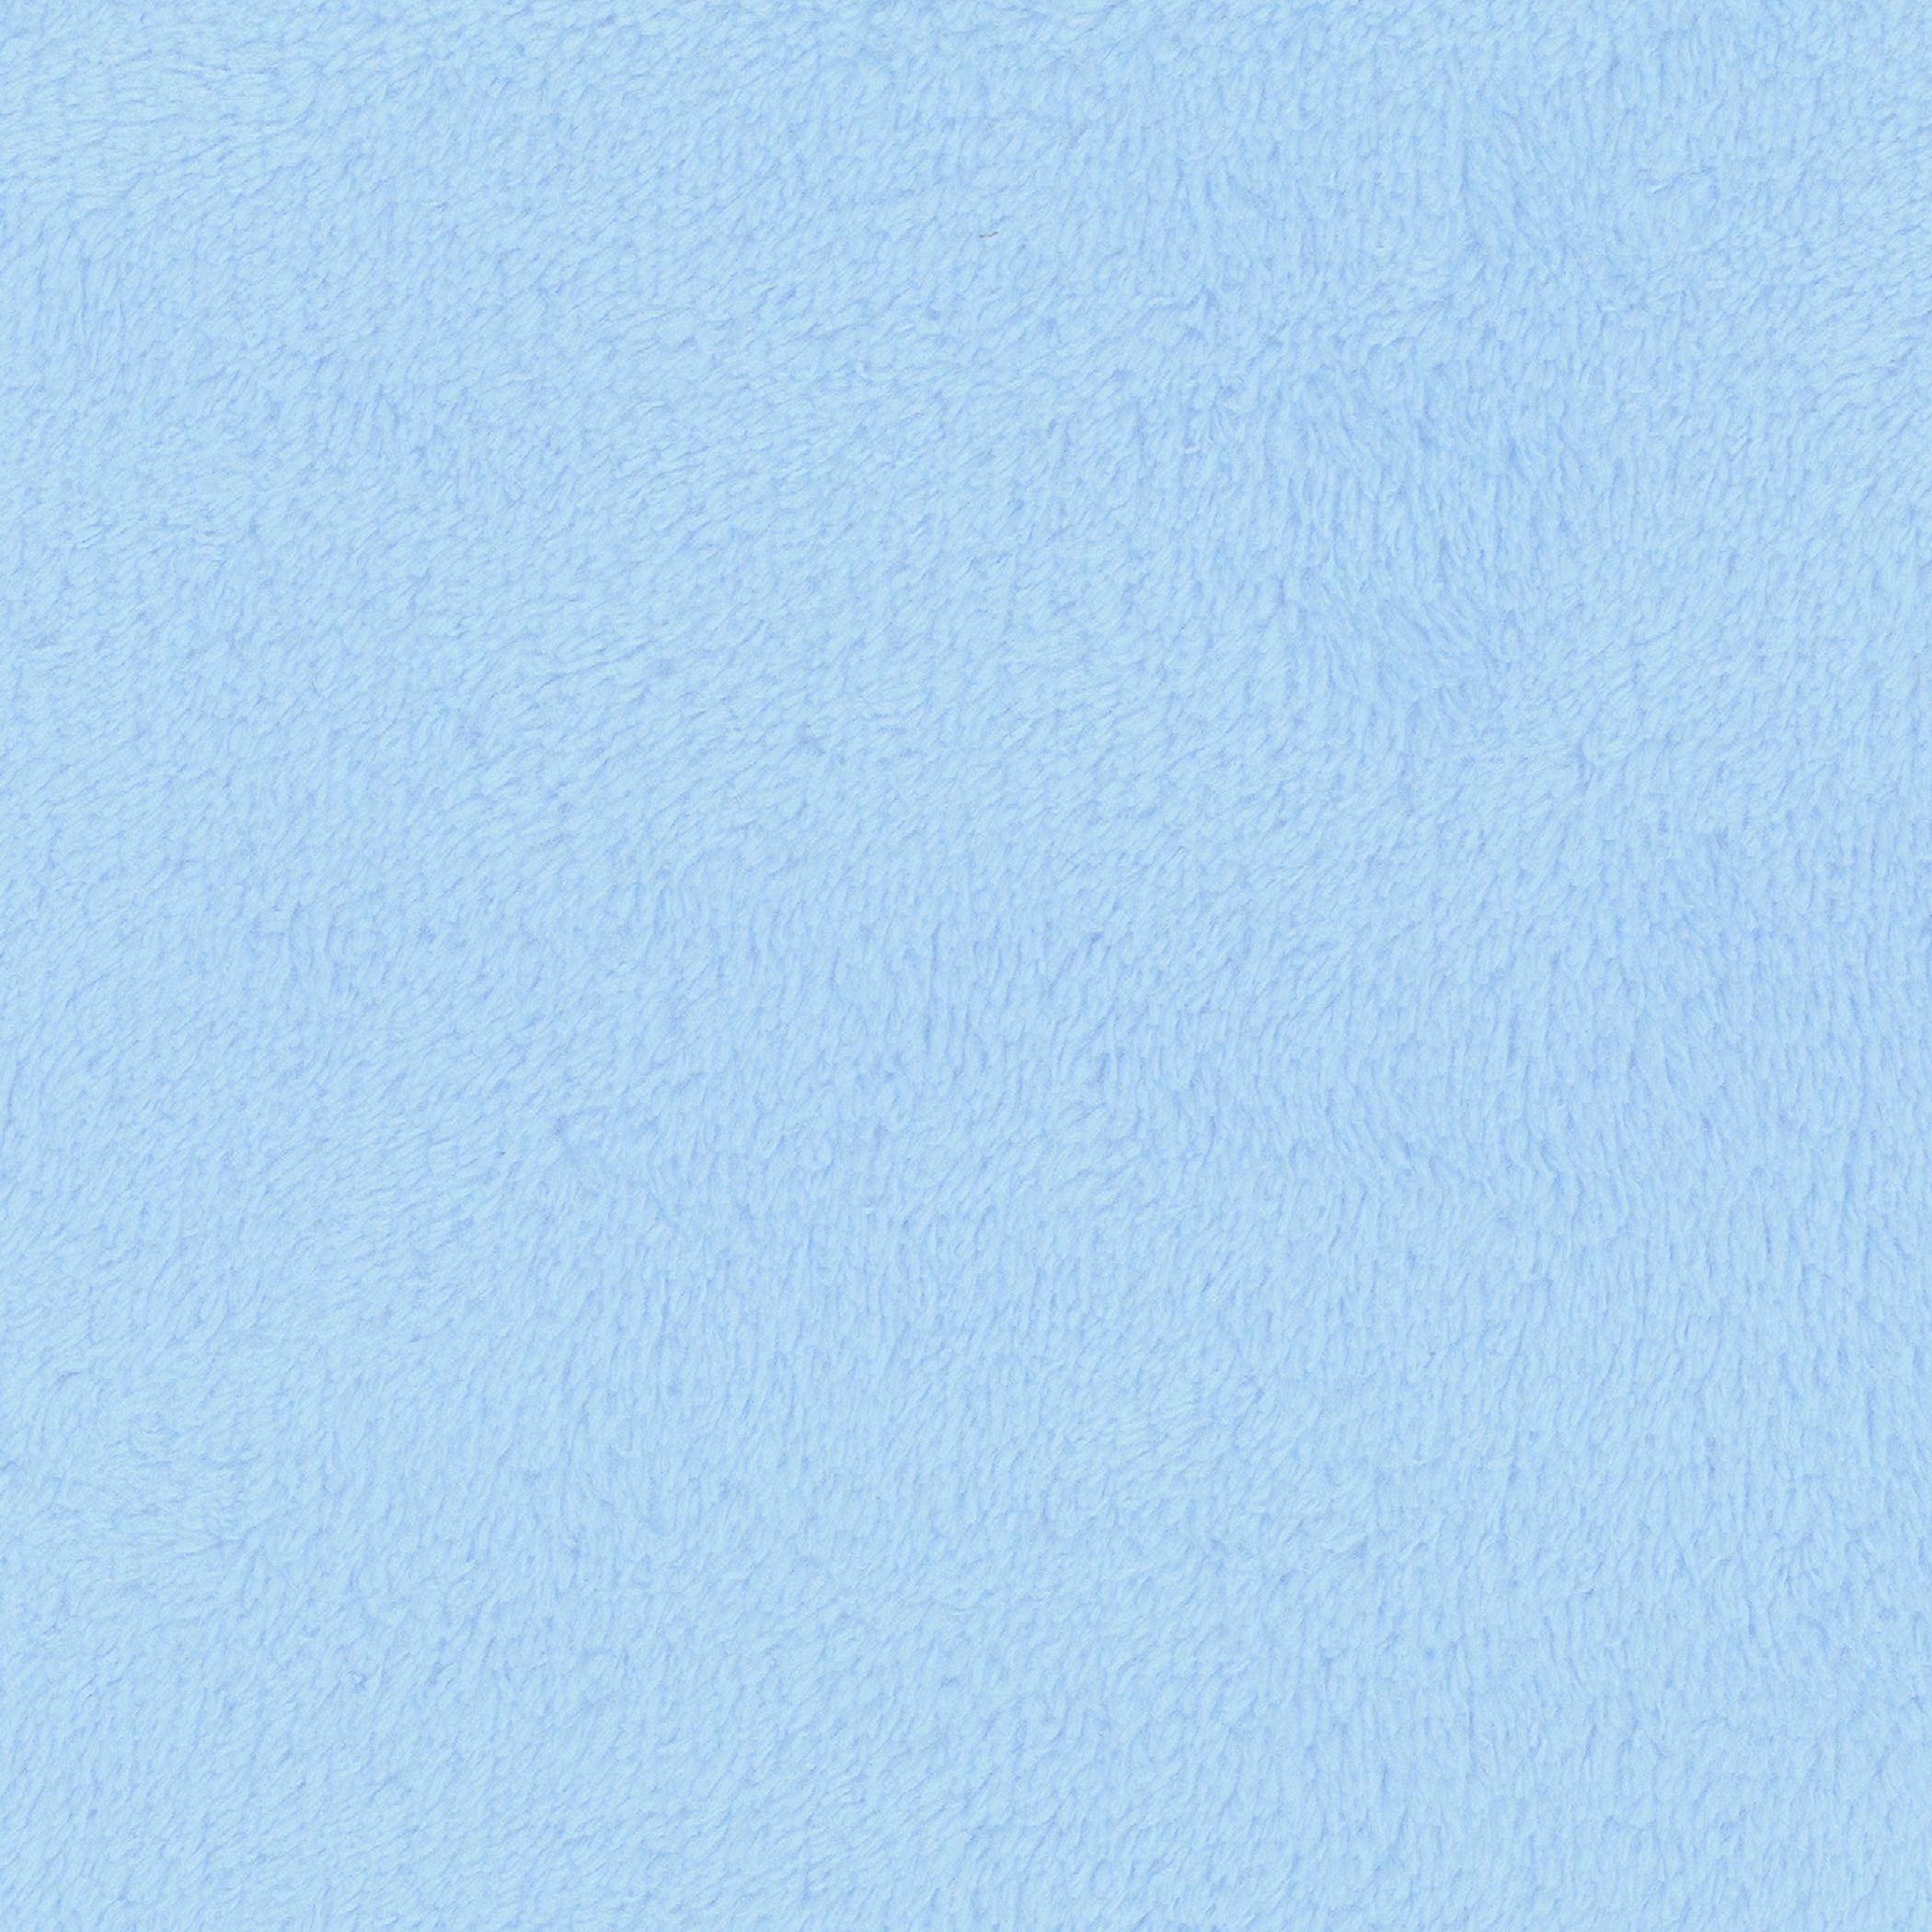 SHASON TEXTILE (2 Yards cut) SOFT CORAL FLEECE SOLID, LT BLUE.